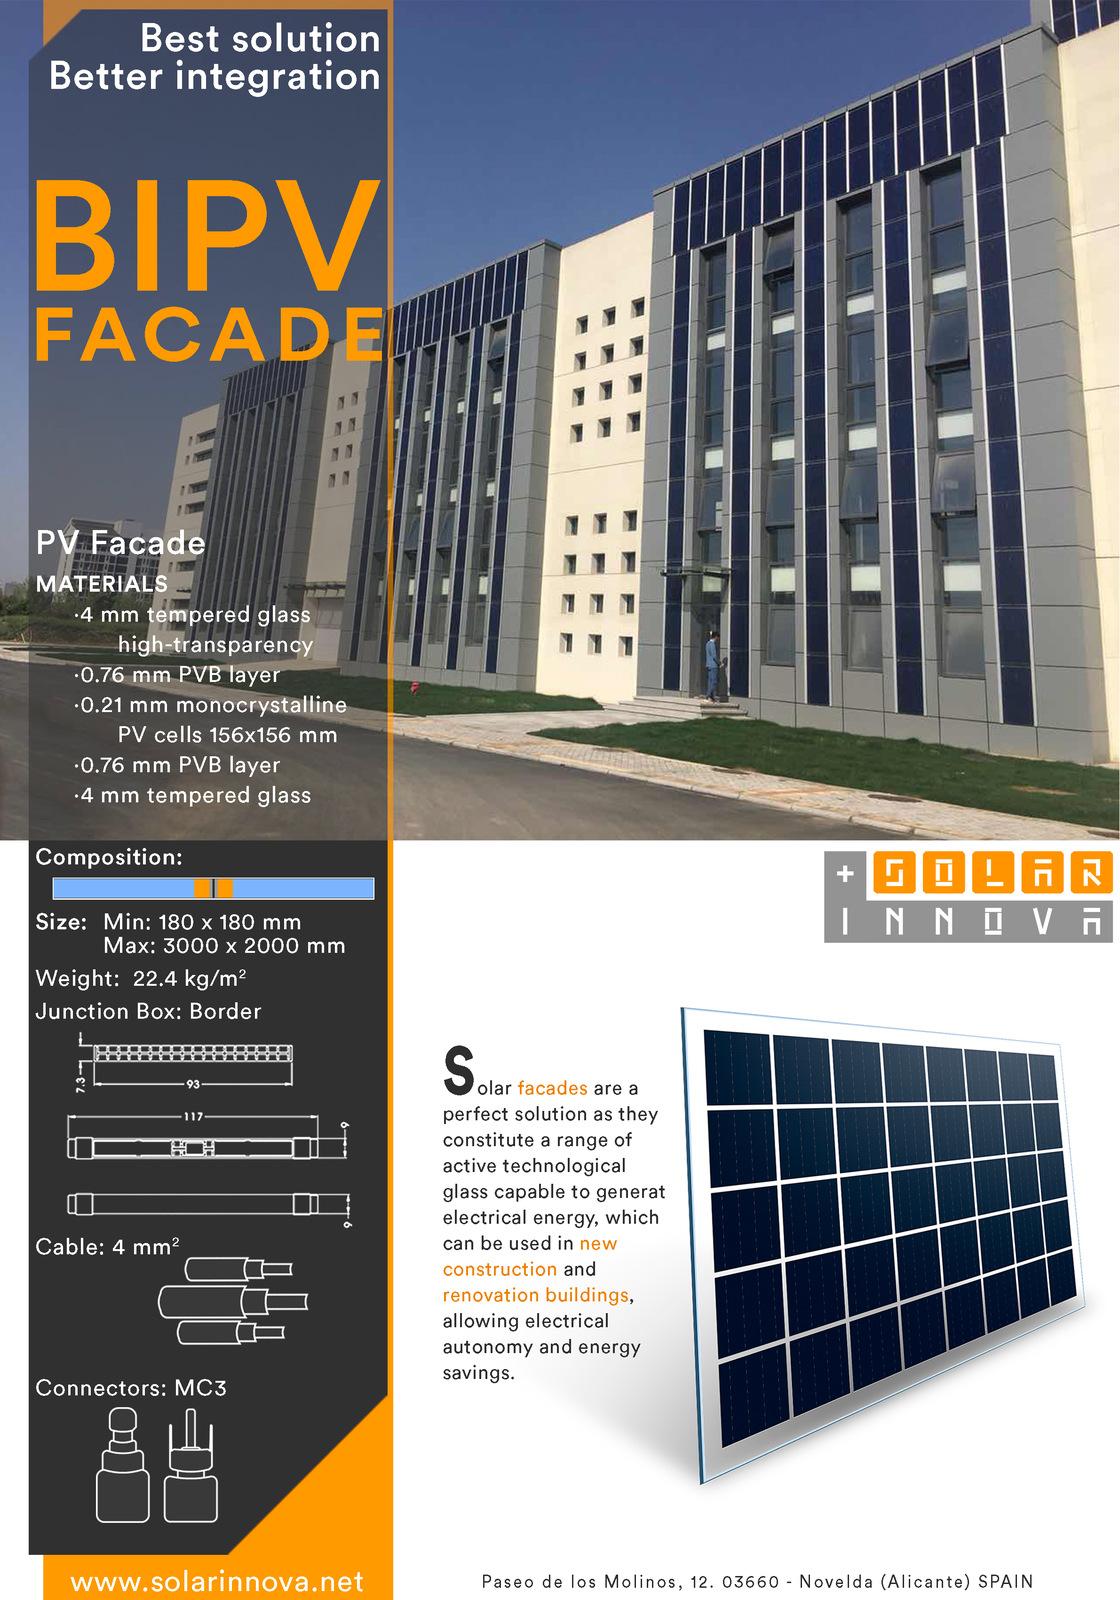 https://solarinnova.pl/wp-content/uploads/2021/04/katalog-2021-bipv-fasada-en_Strona_1.com_.jpg